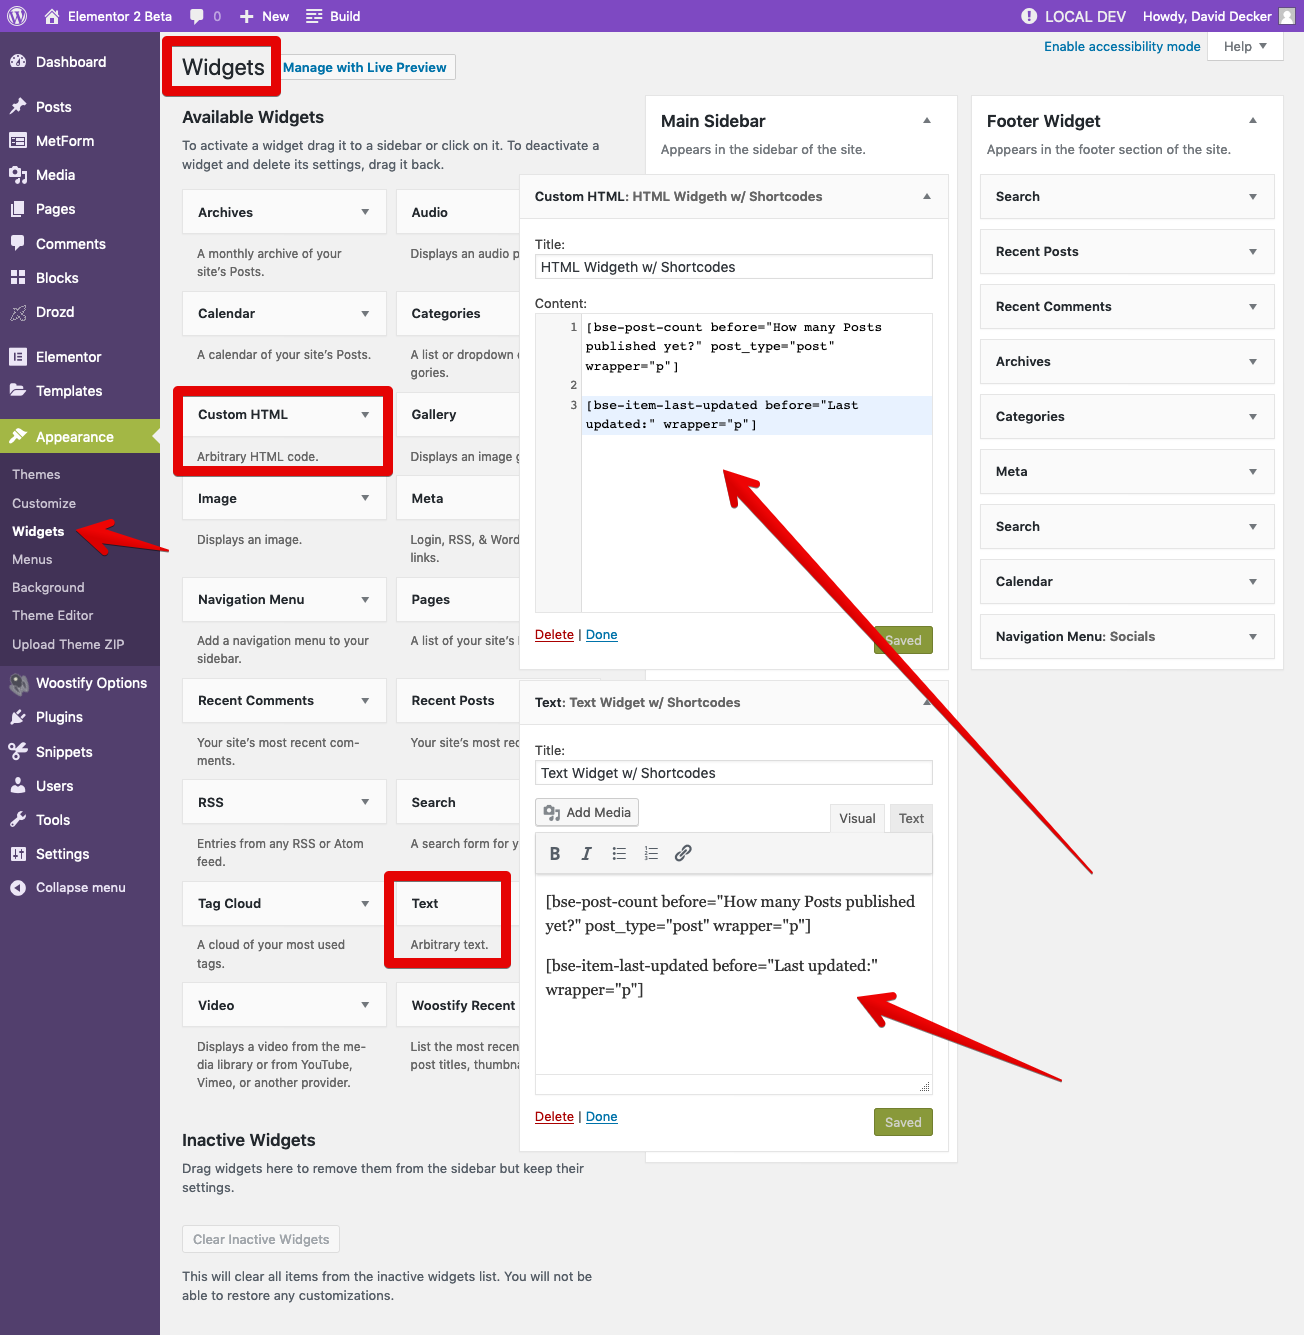 Insert a Shortcode into Text Widget or Custom HTML Widget